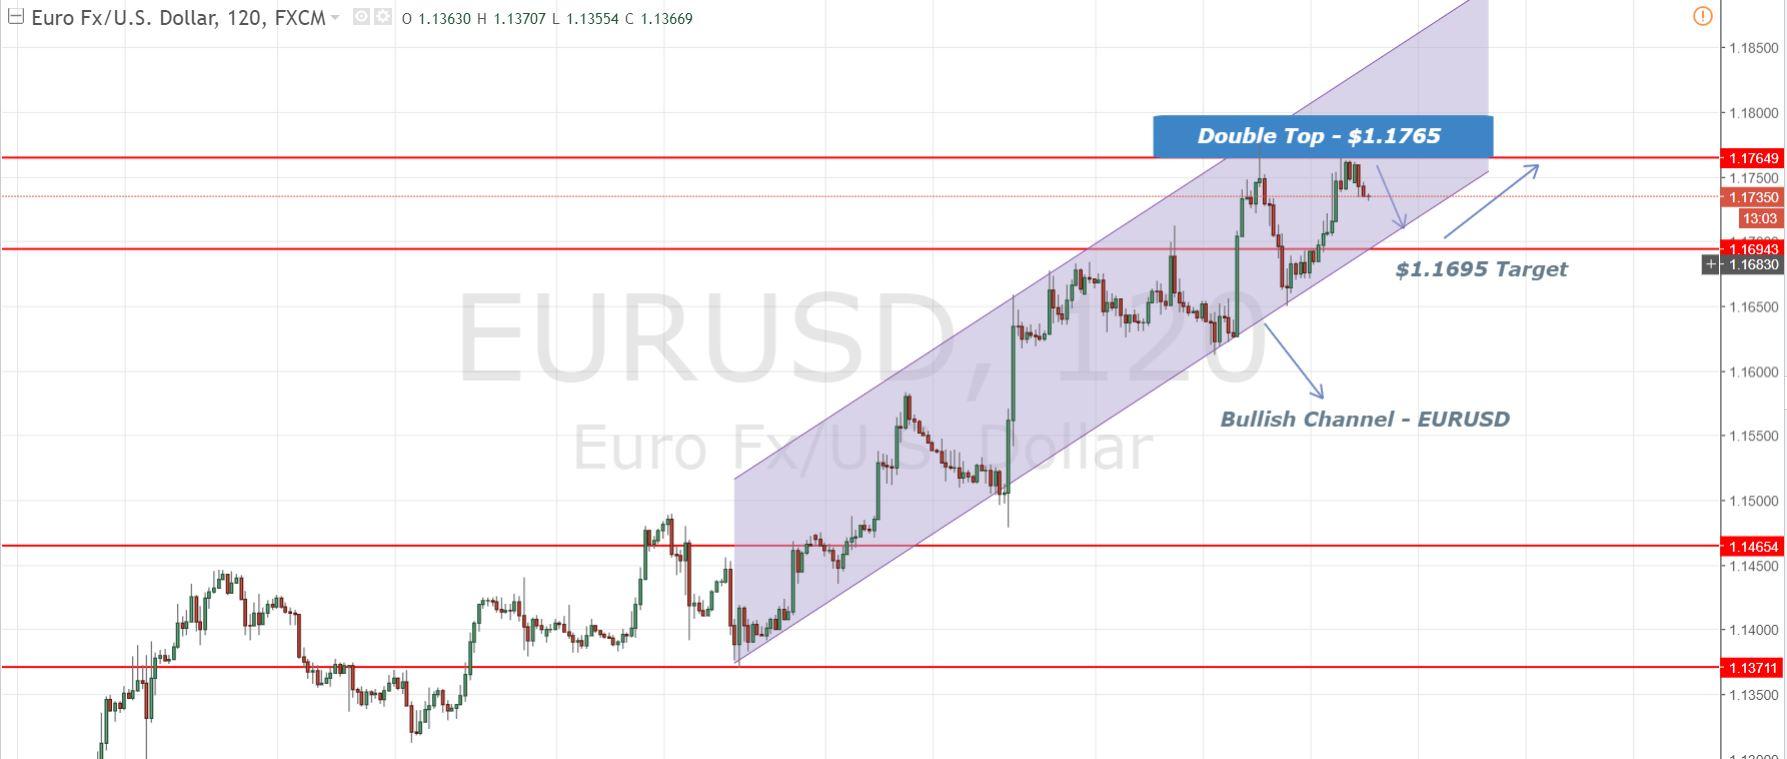 EURUSD - 2 Hours Chart - Double Top & Bullish Channel